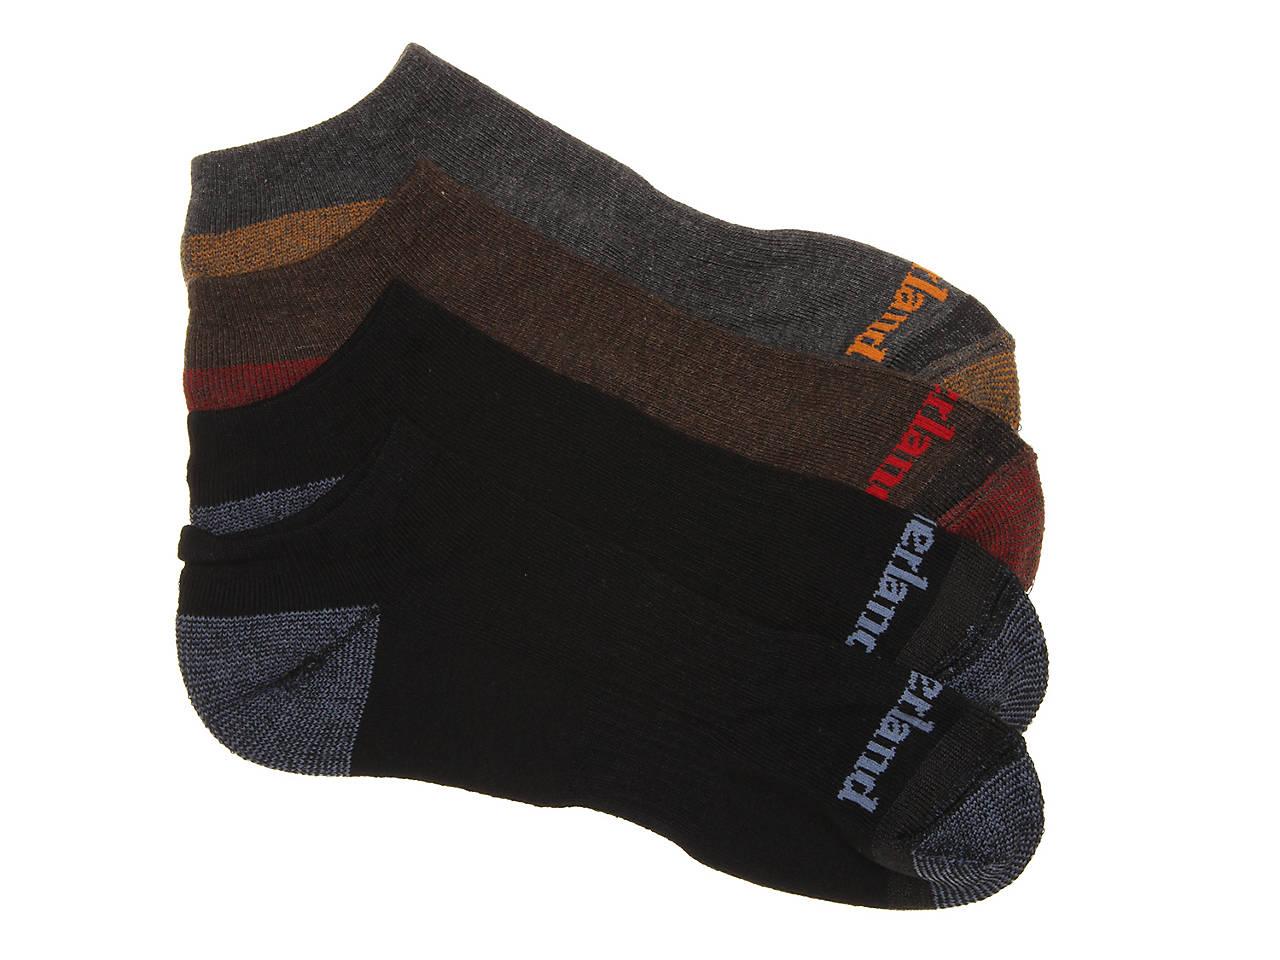 83128e65b7d5b Timberland Cushioned Men's No Show Socks - 4 Pack Men's Handbags ...